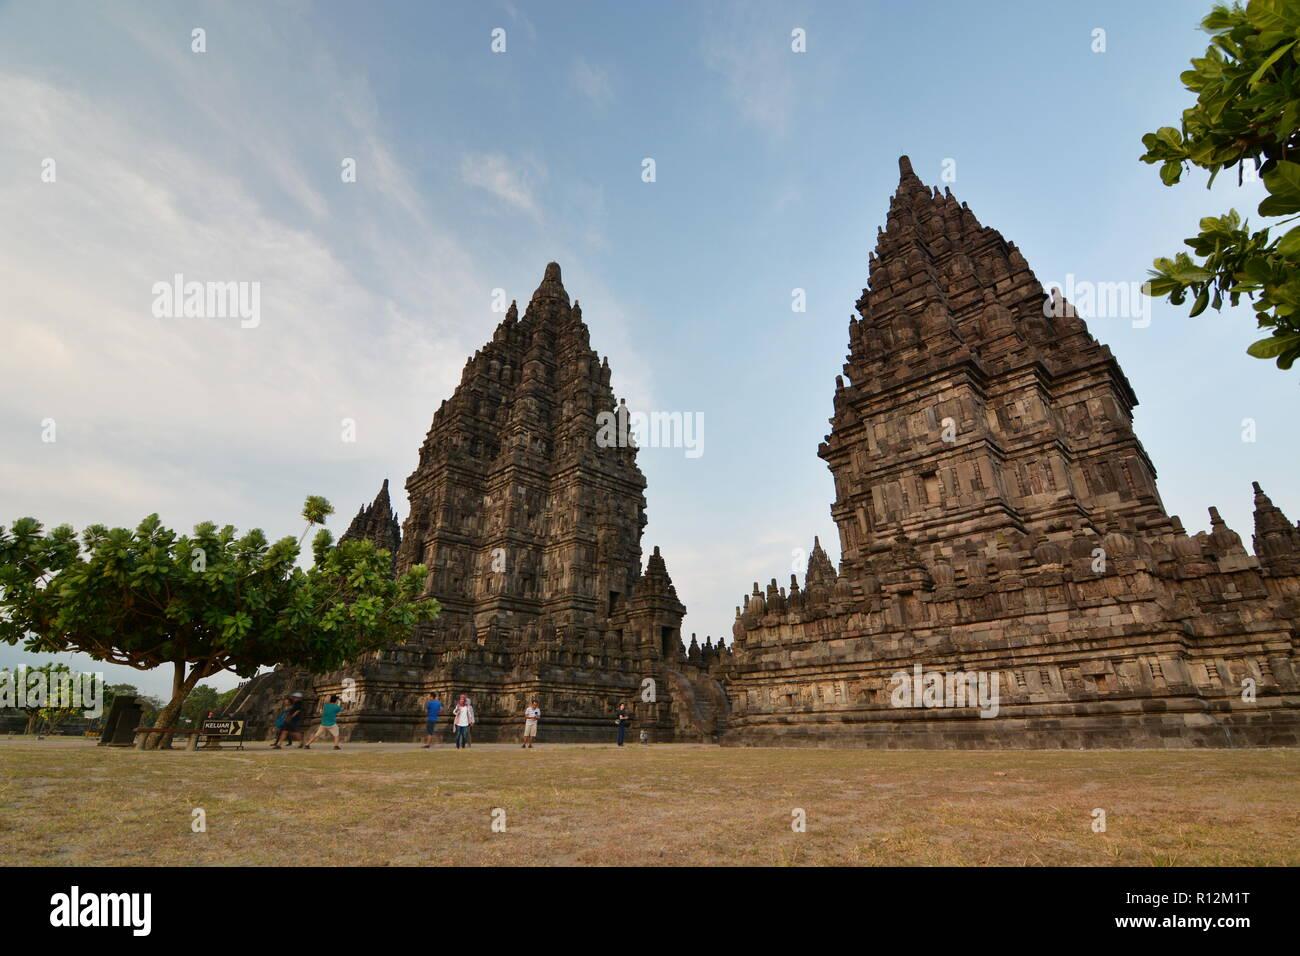 Prambanan temples. Yogyakarta. Central Java. Indonesia - Stock Image